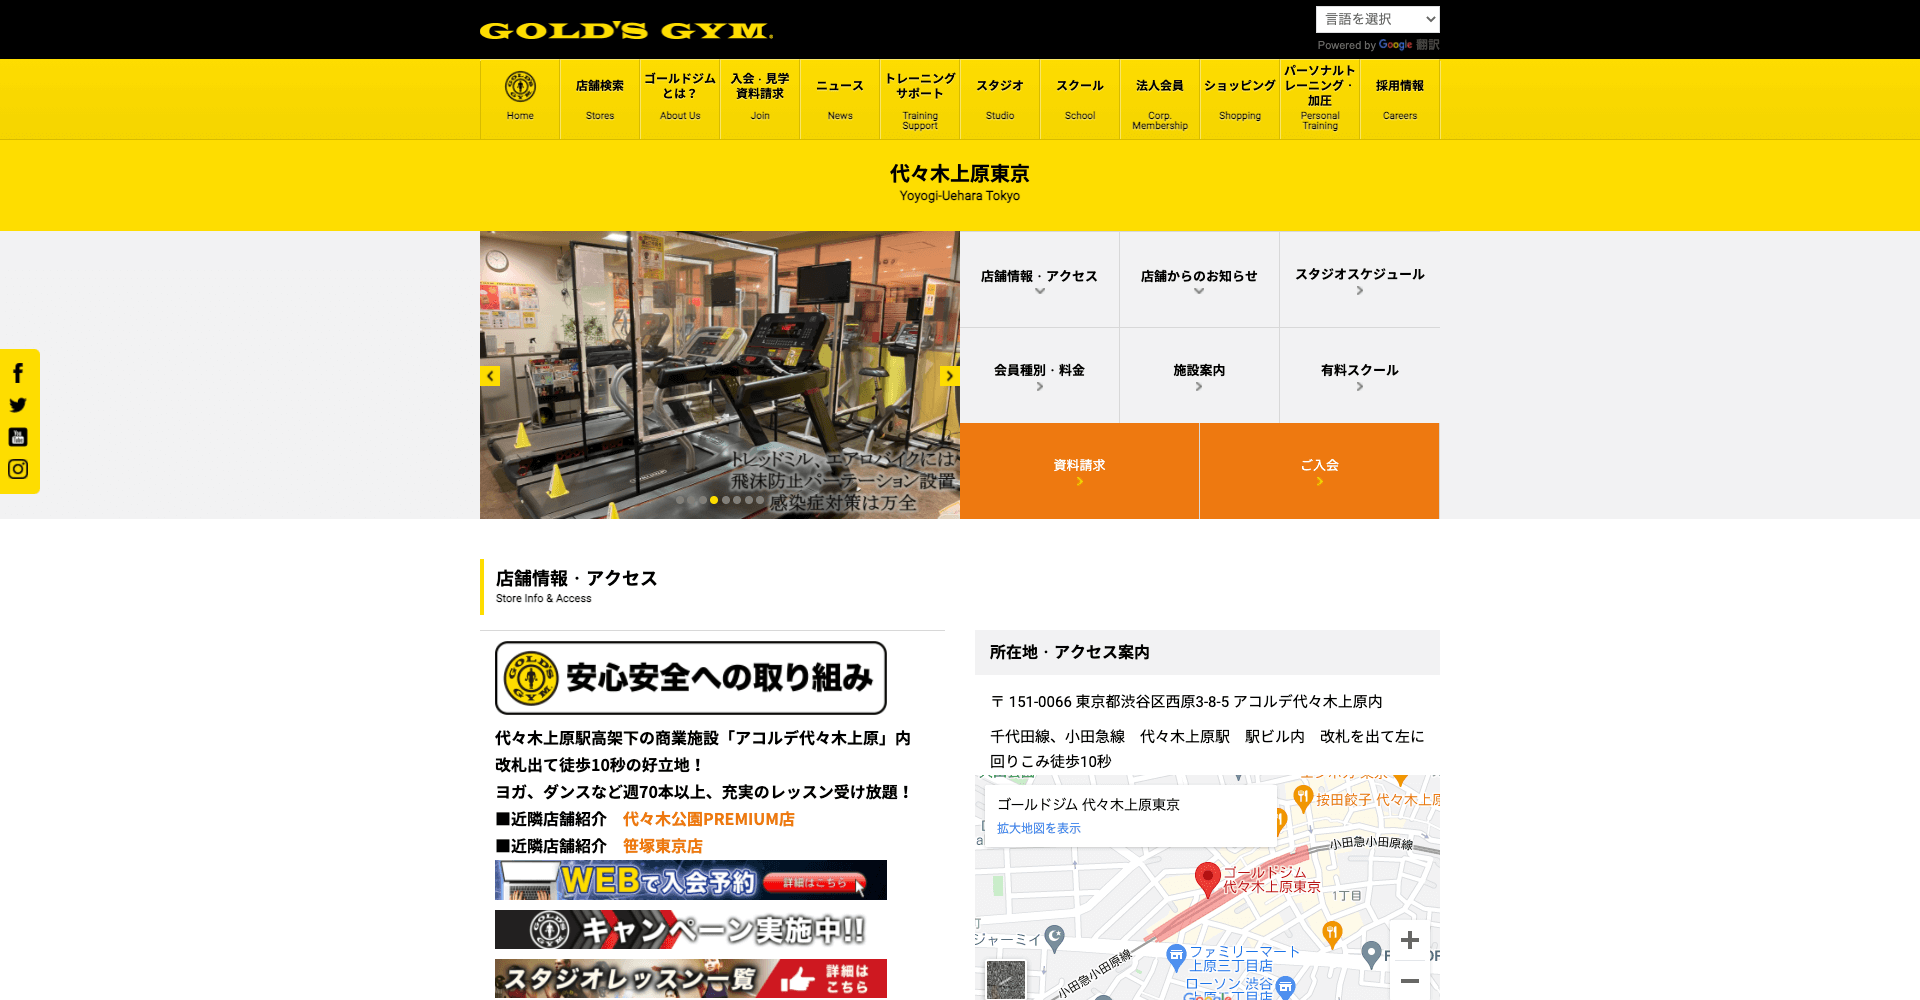 GOLD'SGYM代々木上原東京(ゴールドジム)